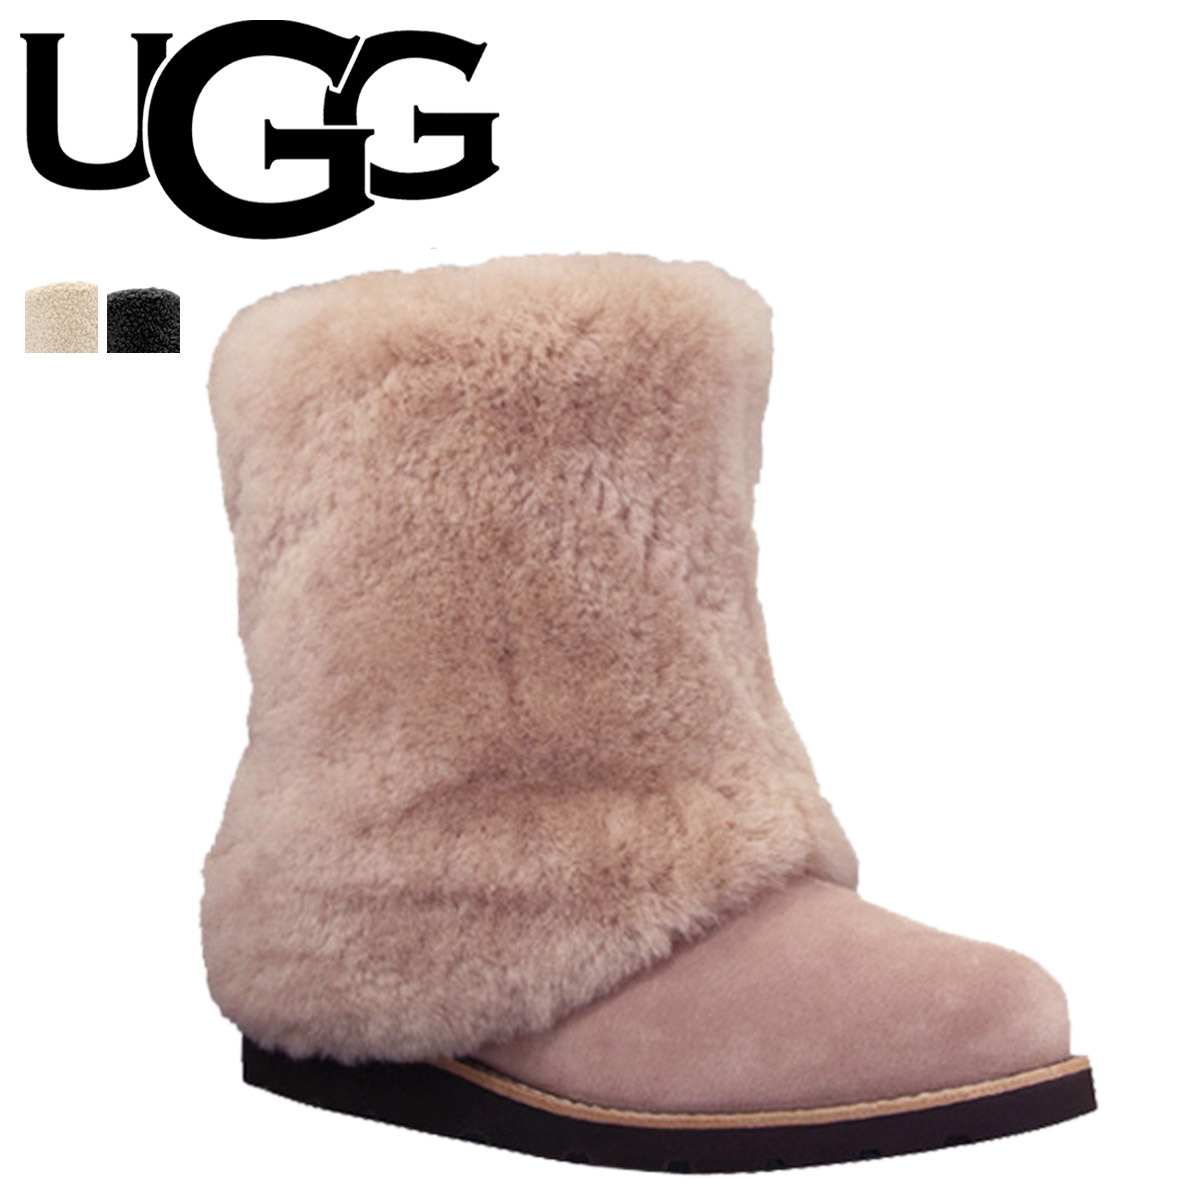 0b935ab1a99 [SOLD OUT] Shearling boots WOMENS MAYLIN 3220 Sheepskin women's UGG Ugg,  Meyrin